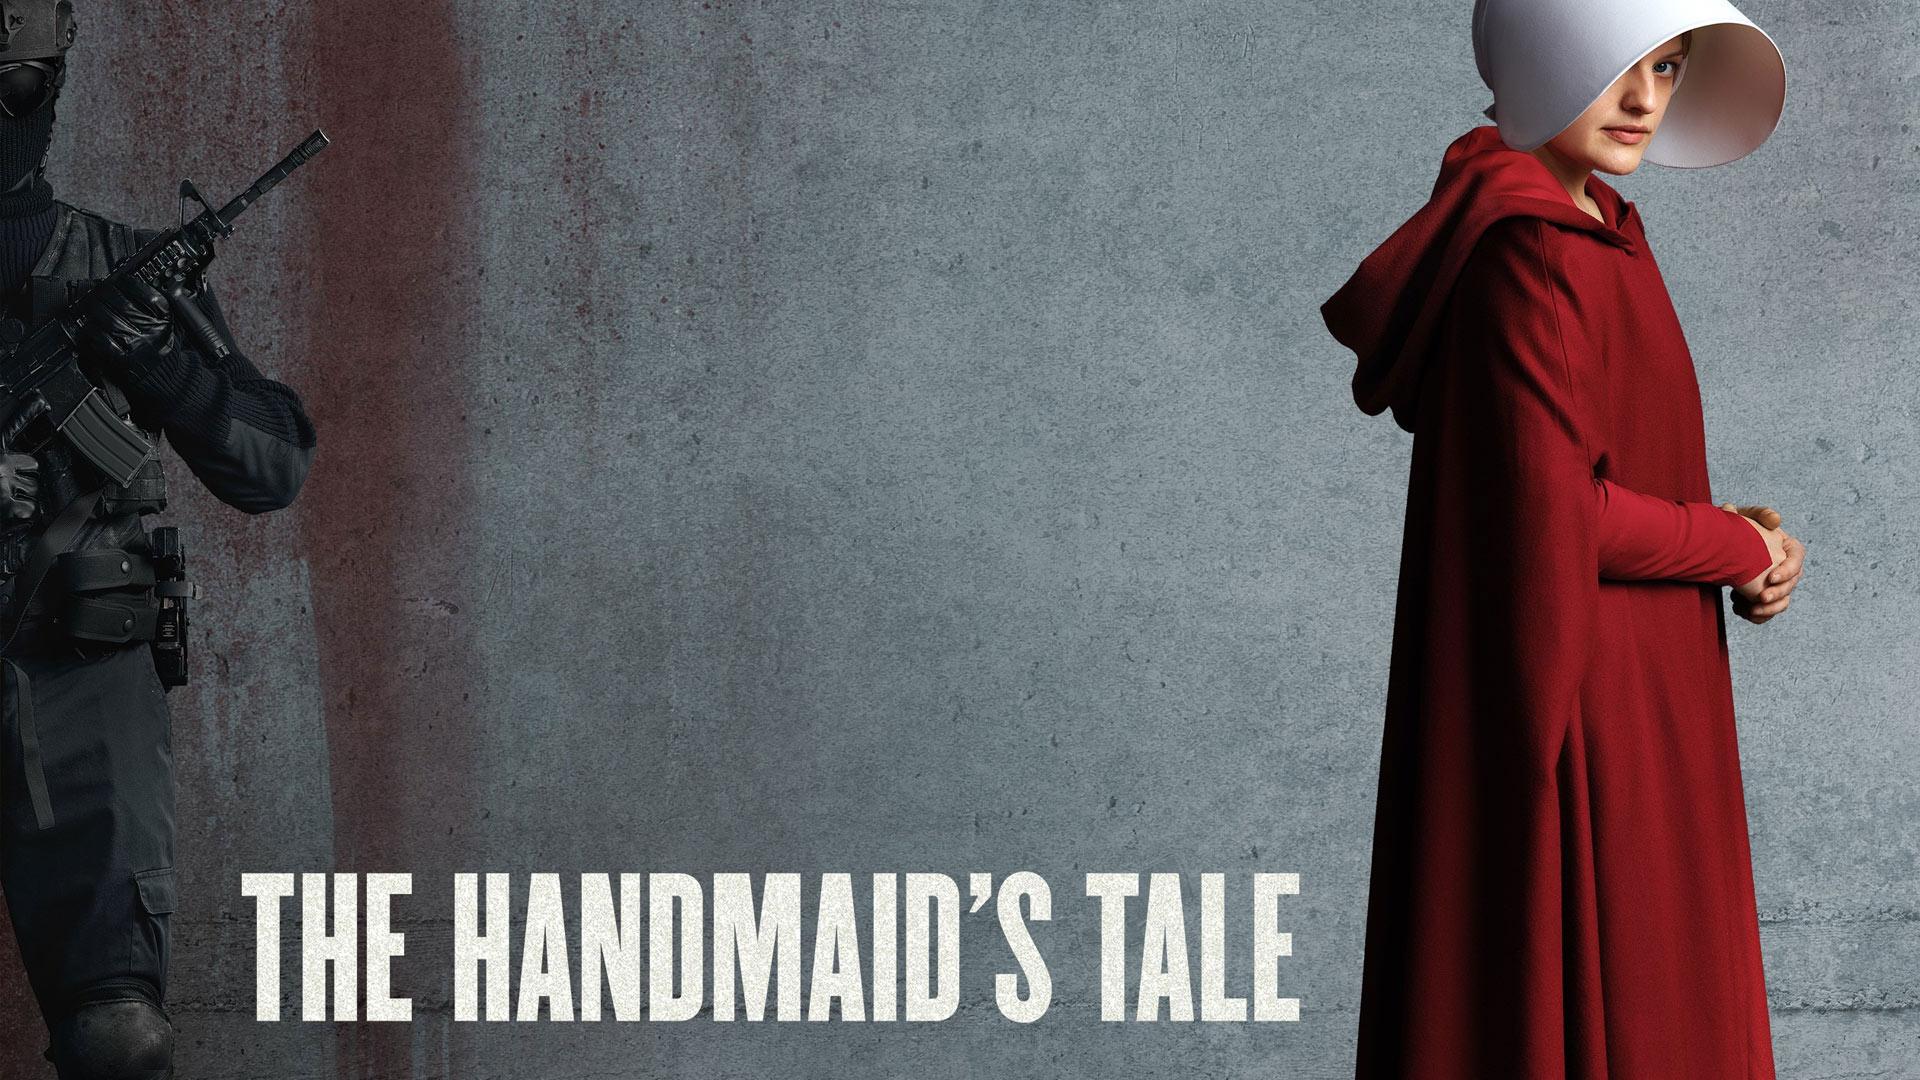 The Handmaid's Tale: Season 1